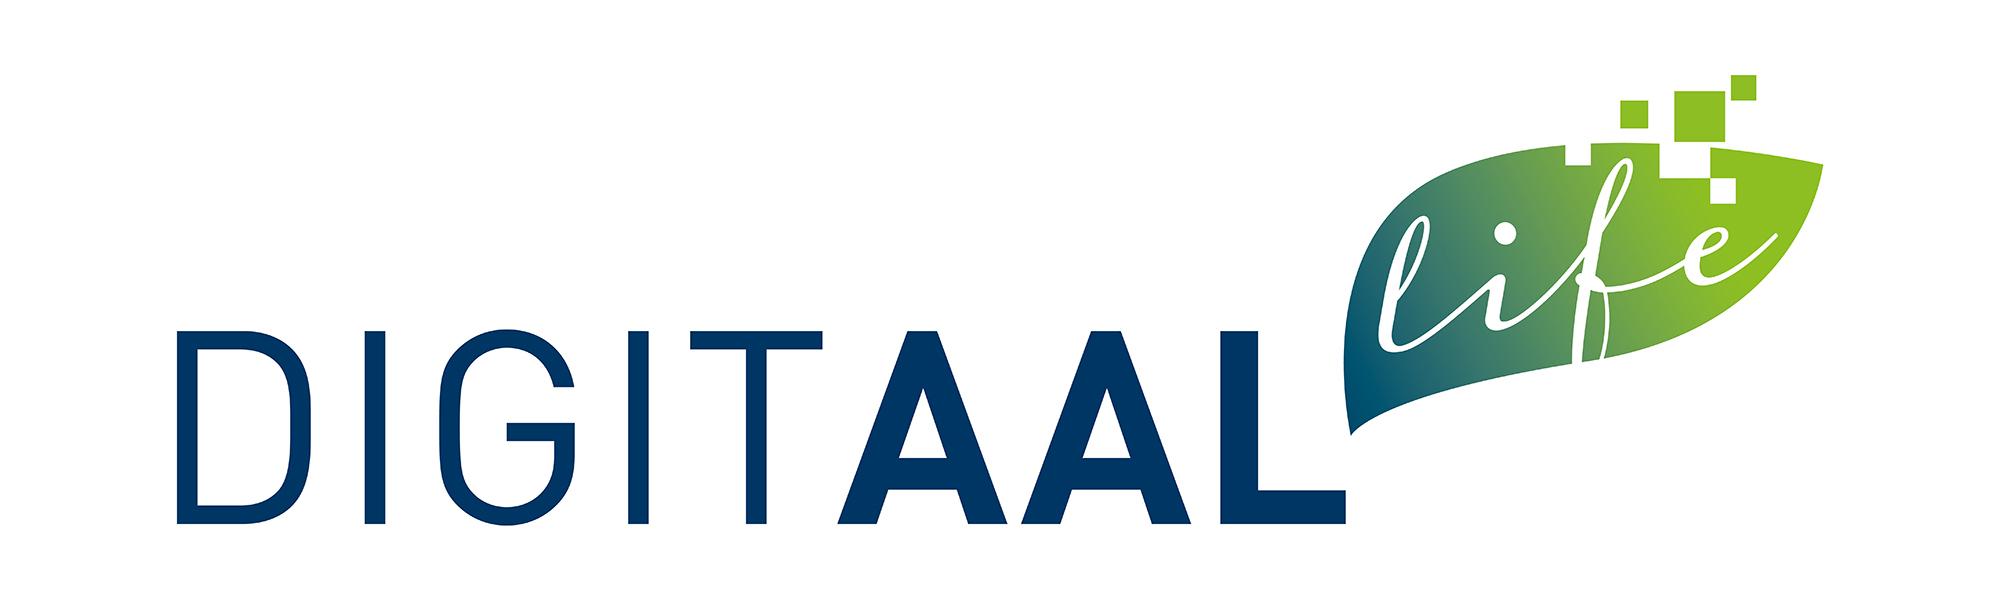 digitaal logo